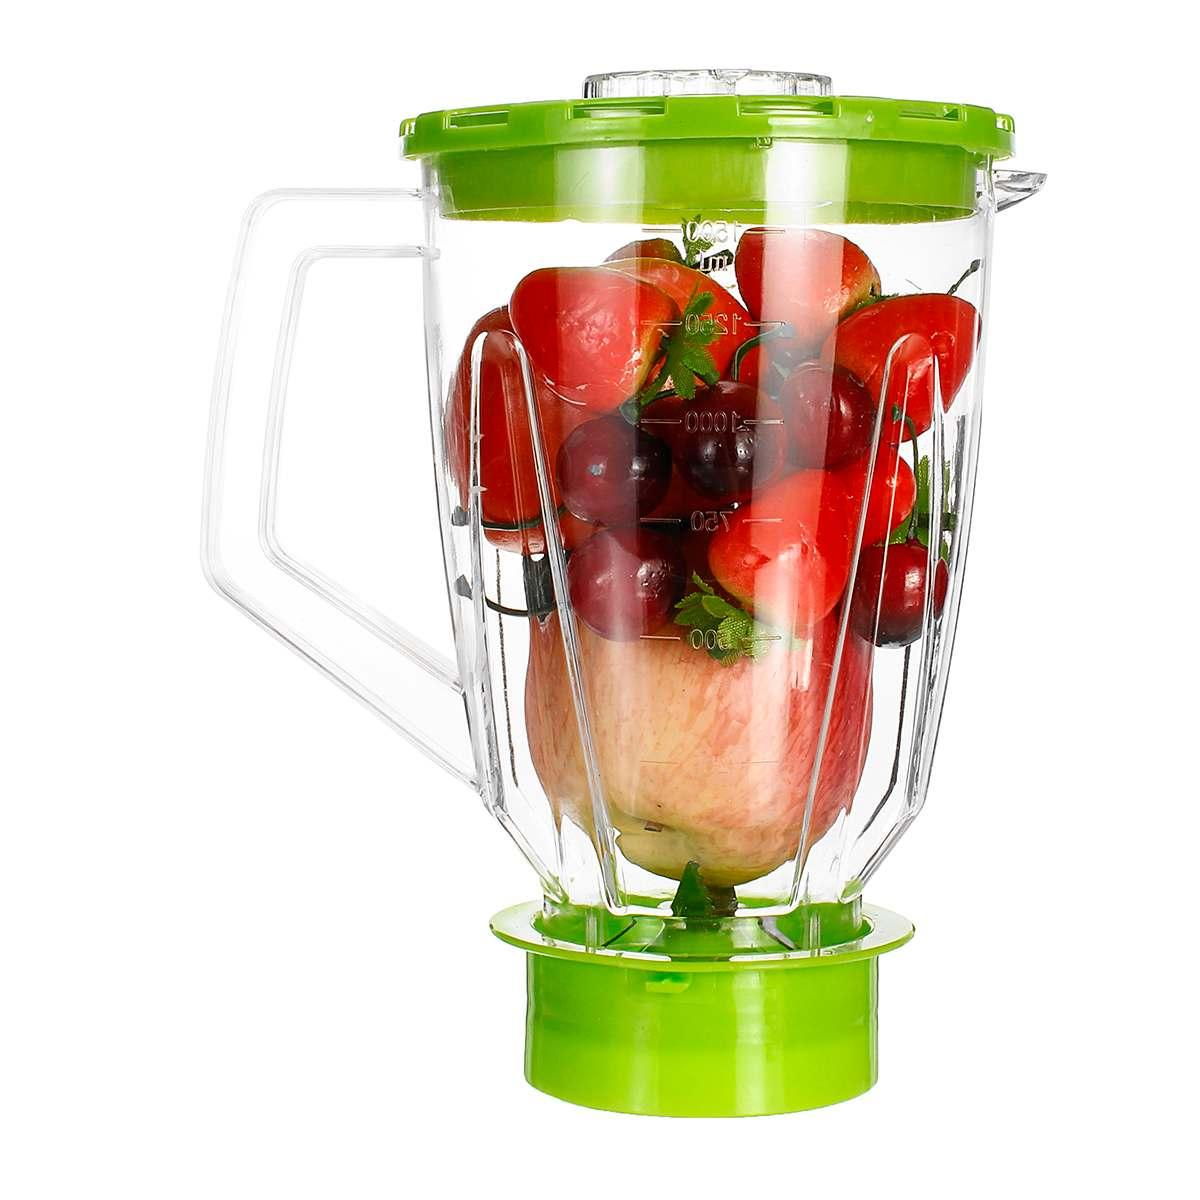 Becornce Multi-functional Nutrition Machine Juice Juicer Timer-Blenders <font><b>Food</b></font>-<font><b>Processor</b></font>